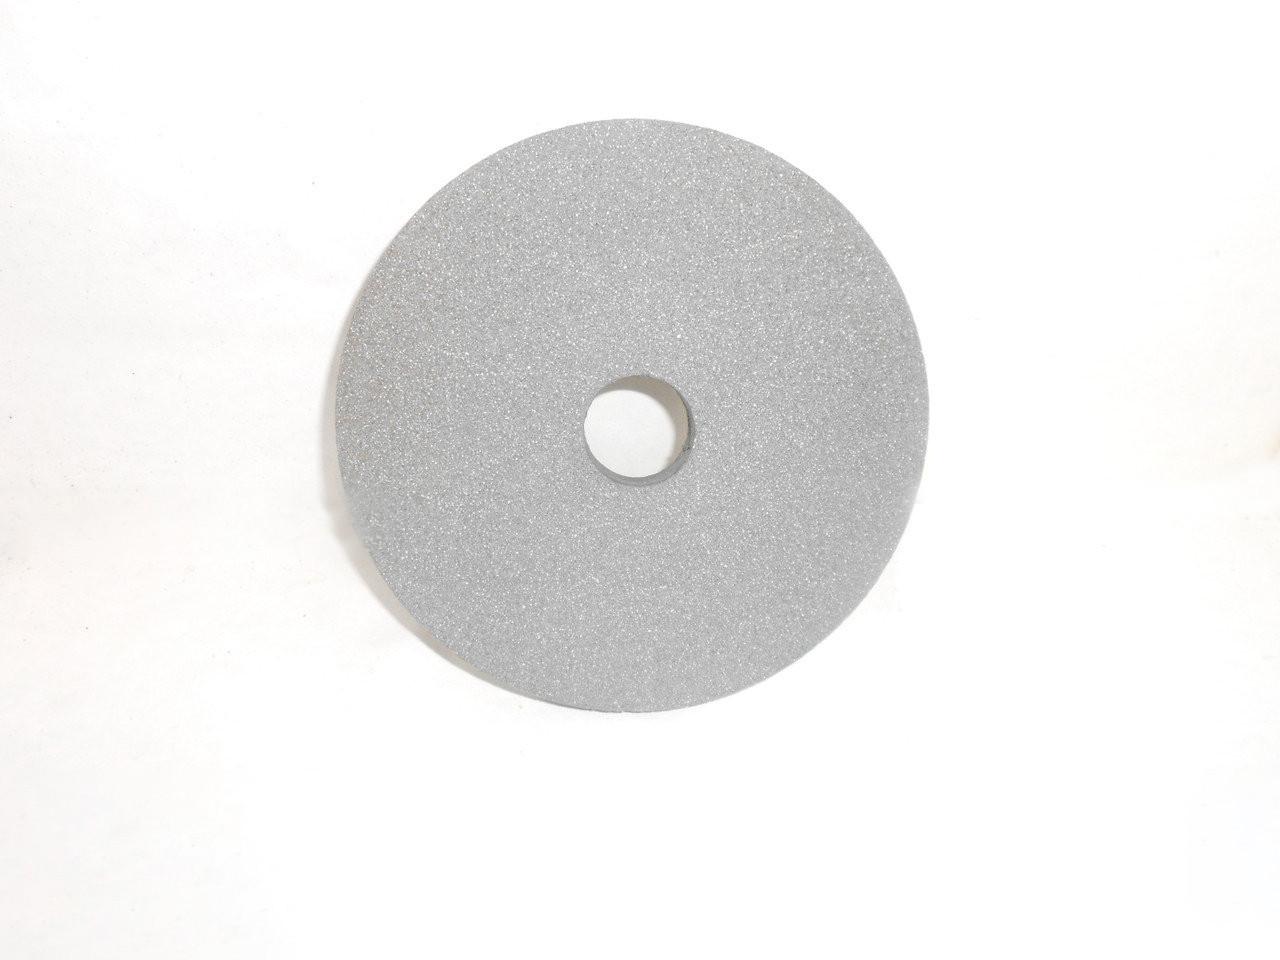 Круг шлифовальный 14А ПП 50х20х20  16 СМ2